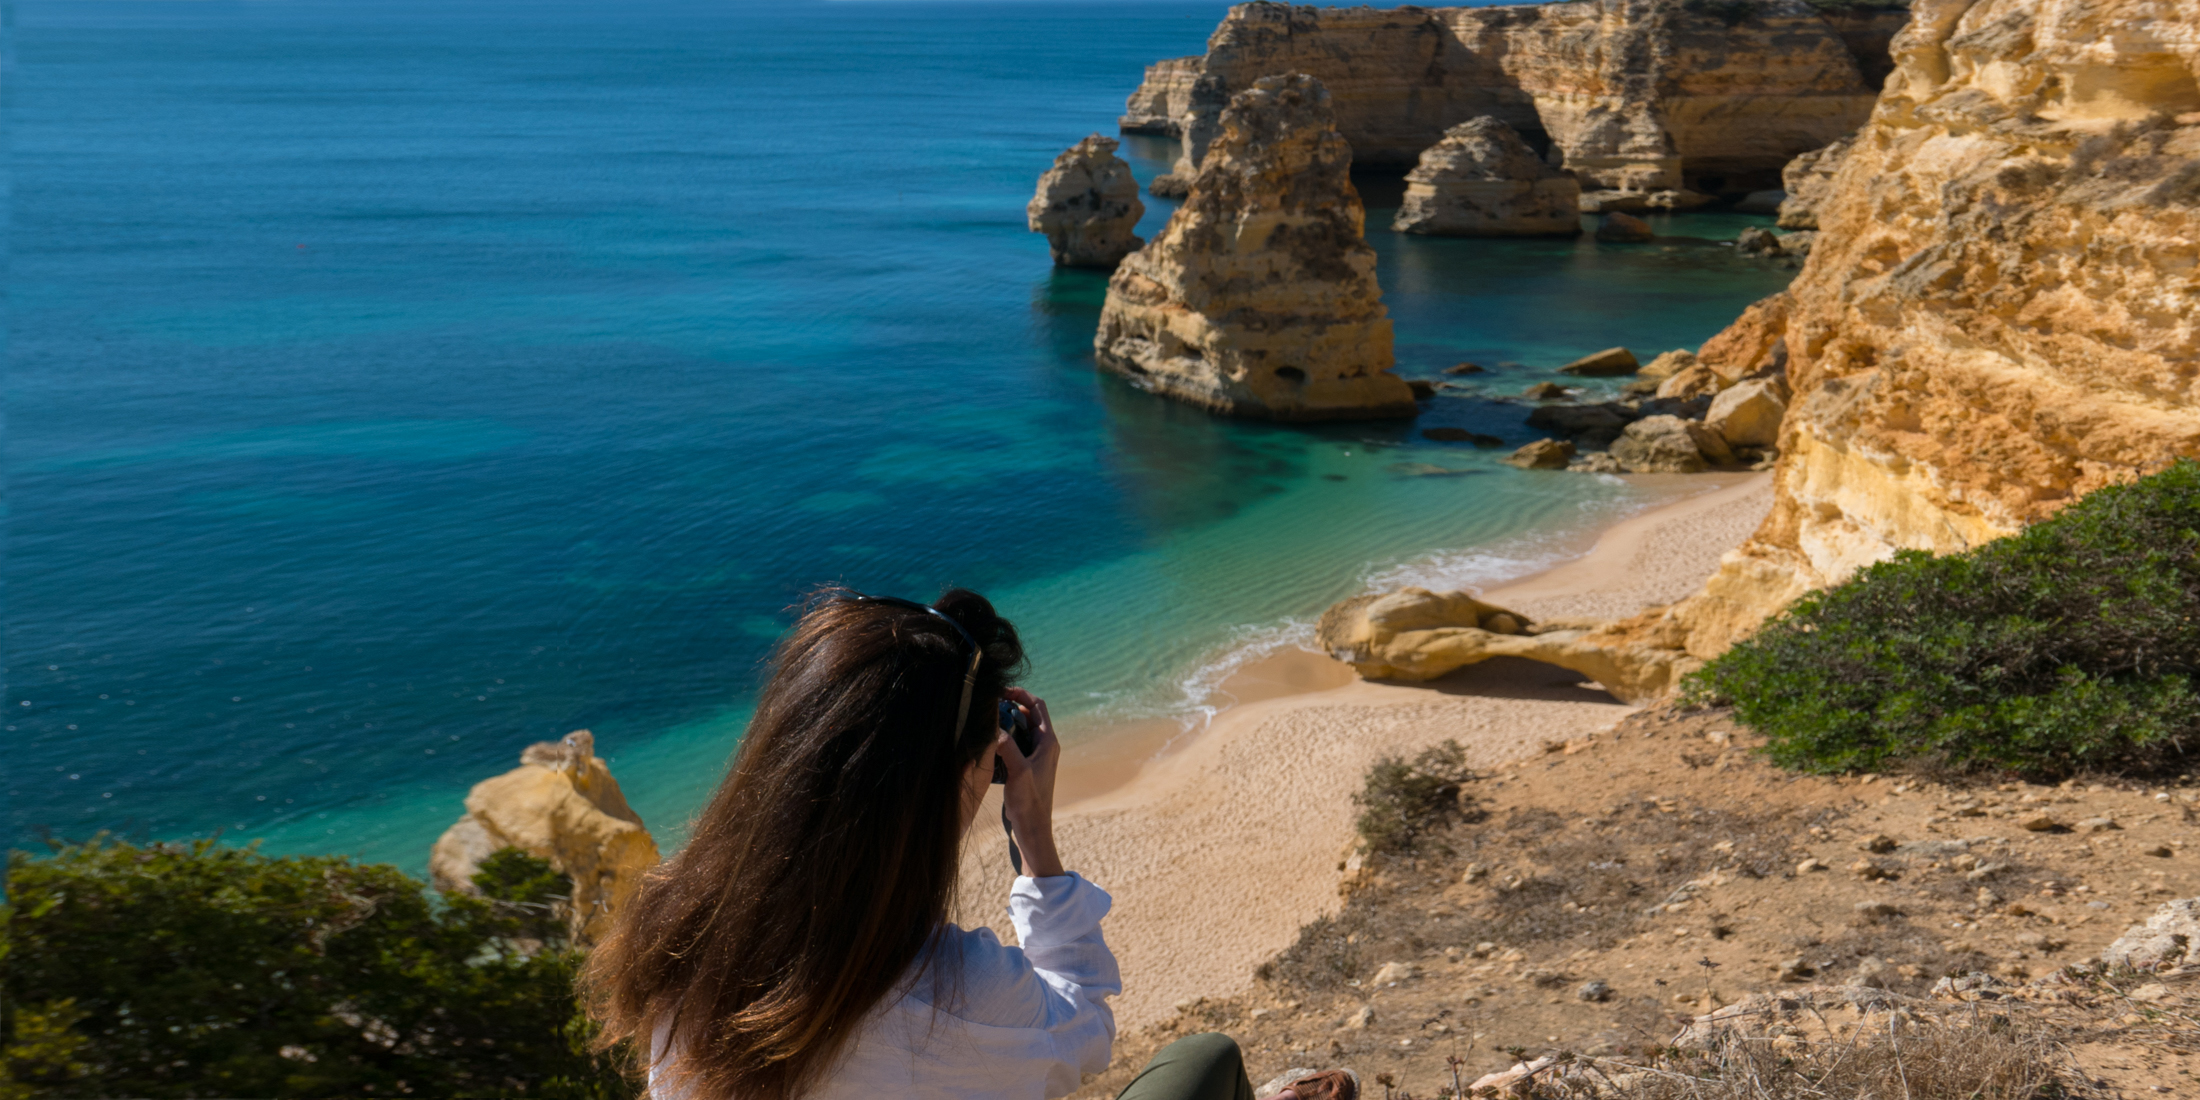 Photo workshops in Lisbon and the Algarve- Algarve: above the Benagil caves, the Benagil coast